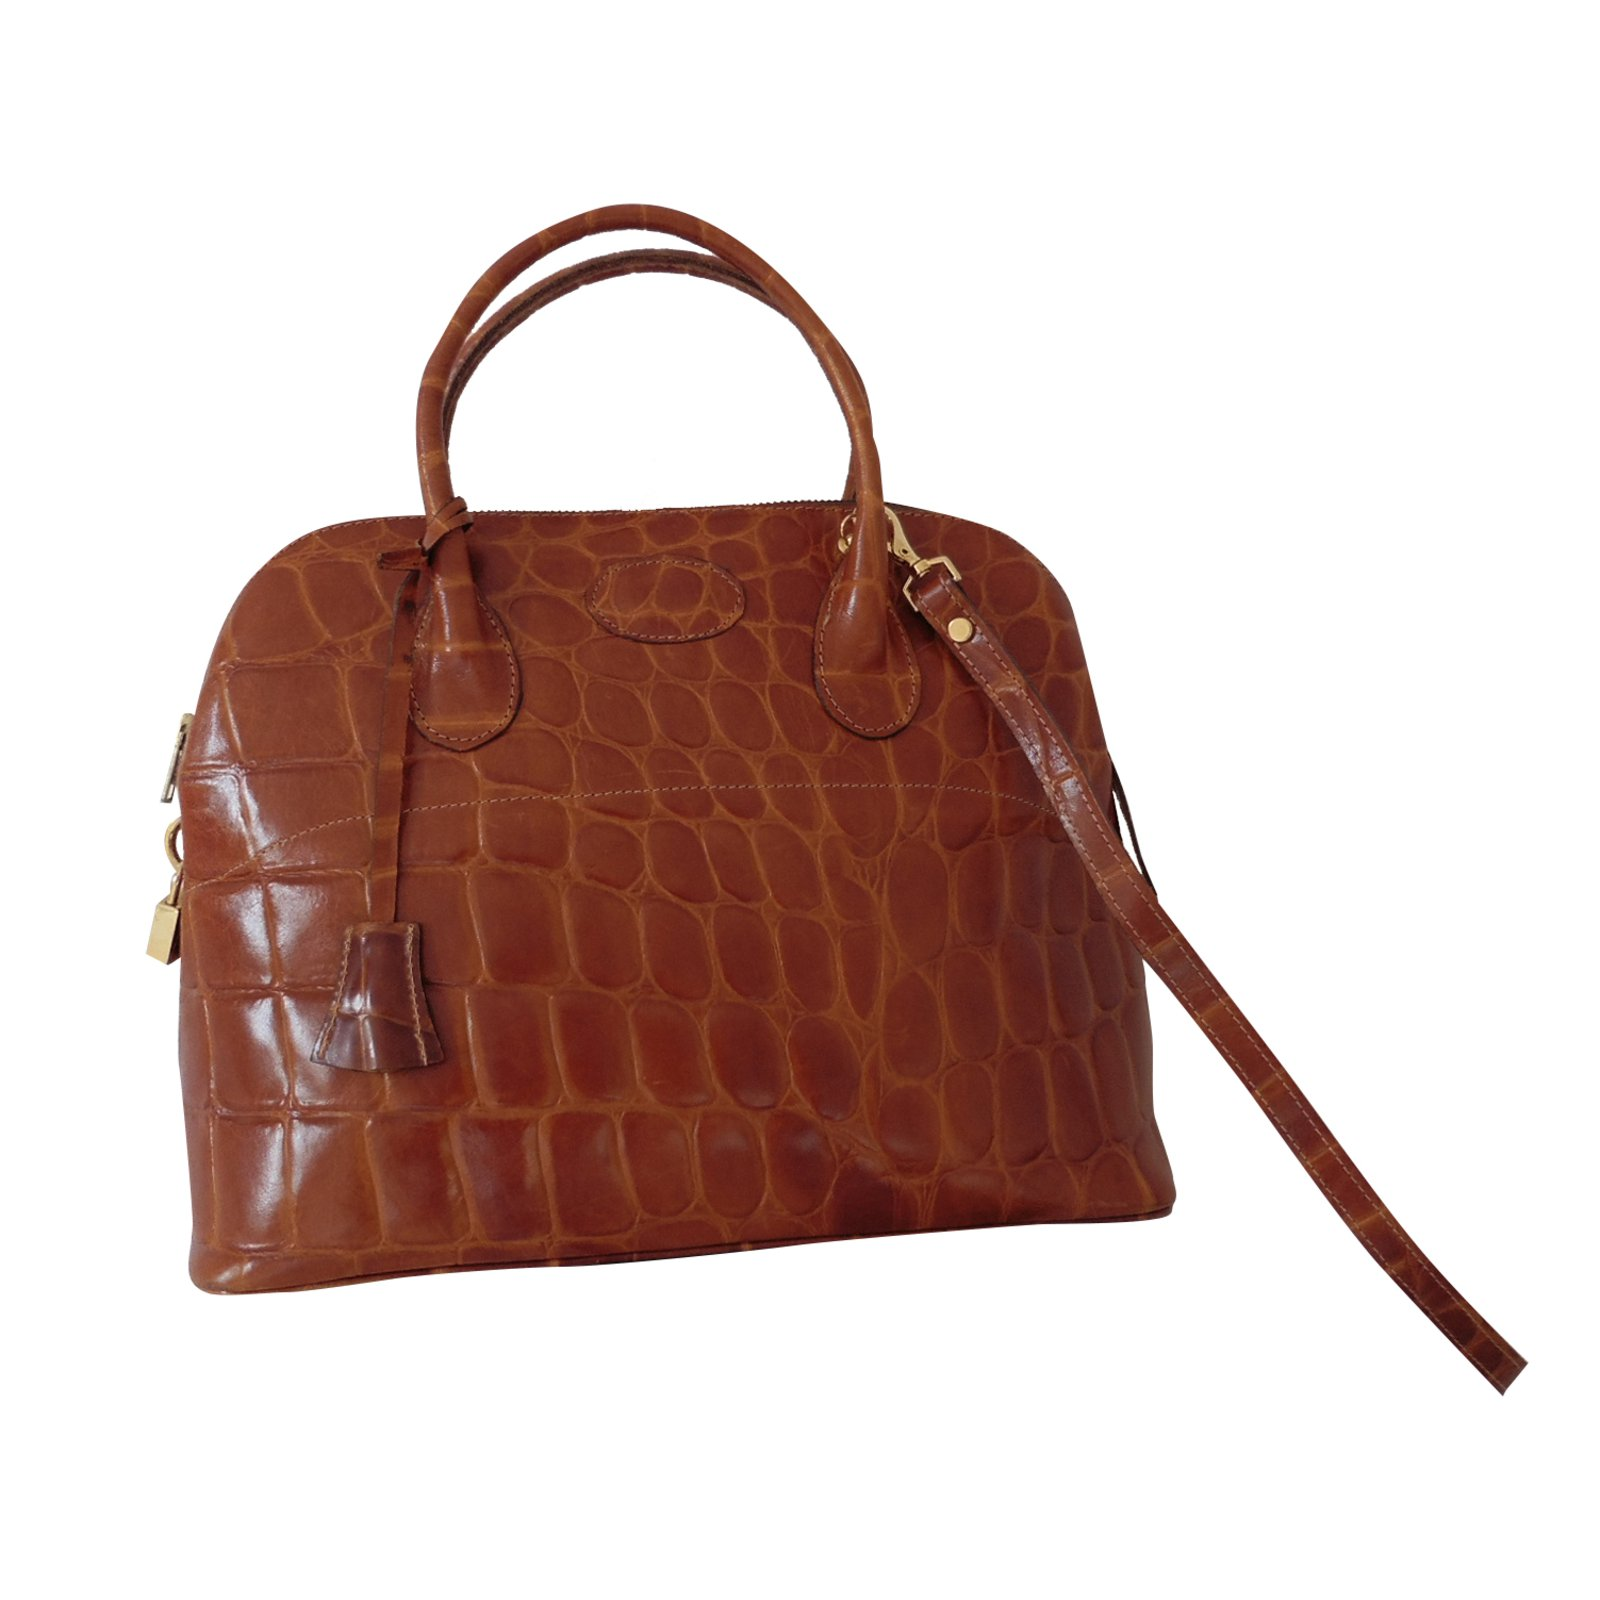 sacs main autre marque sacs main cuir marron. Black Bedroom Furniture Sets. Home Design Ideas